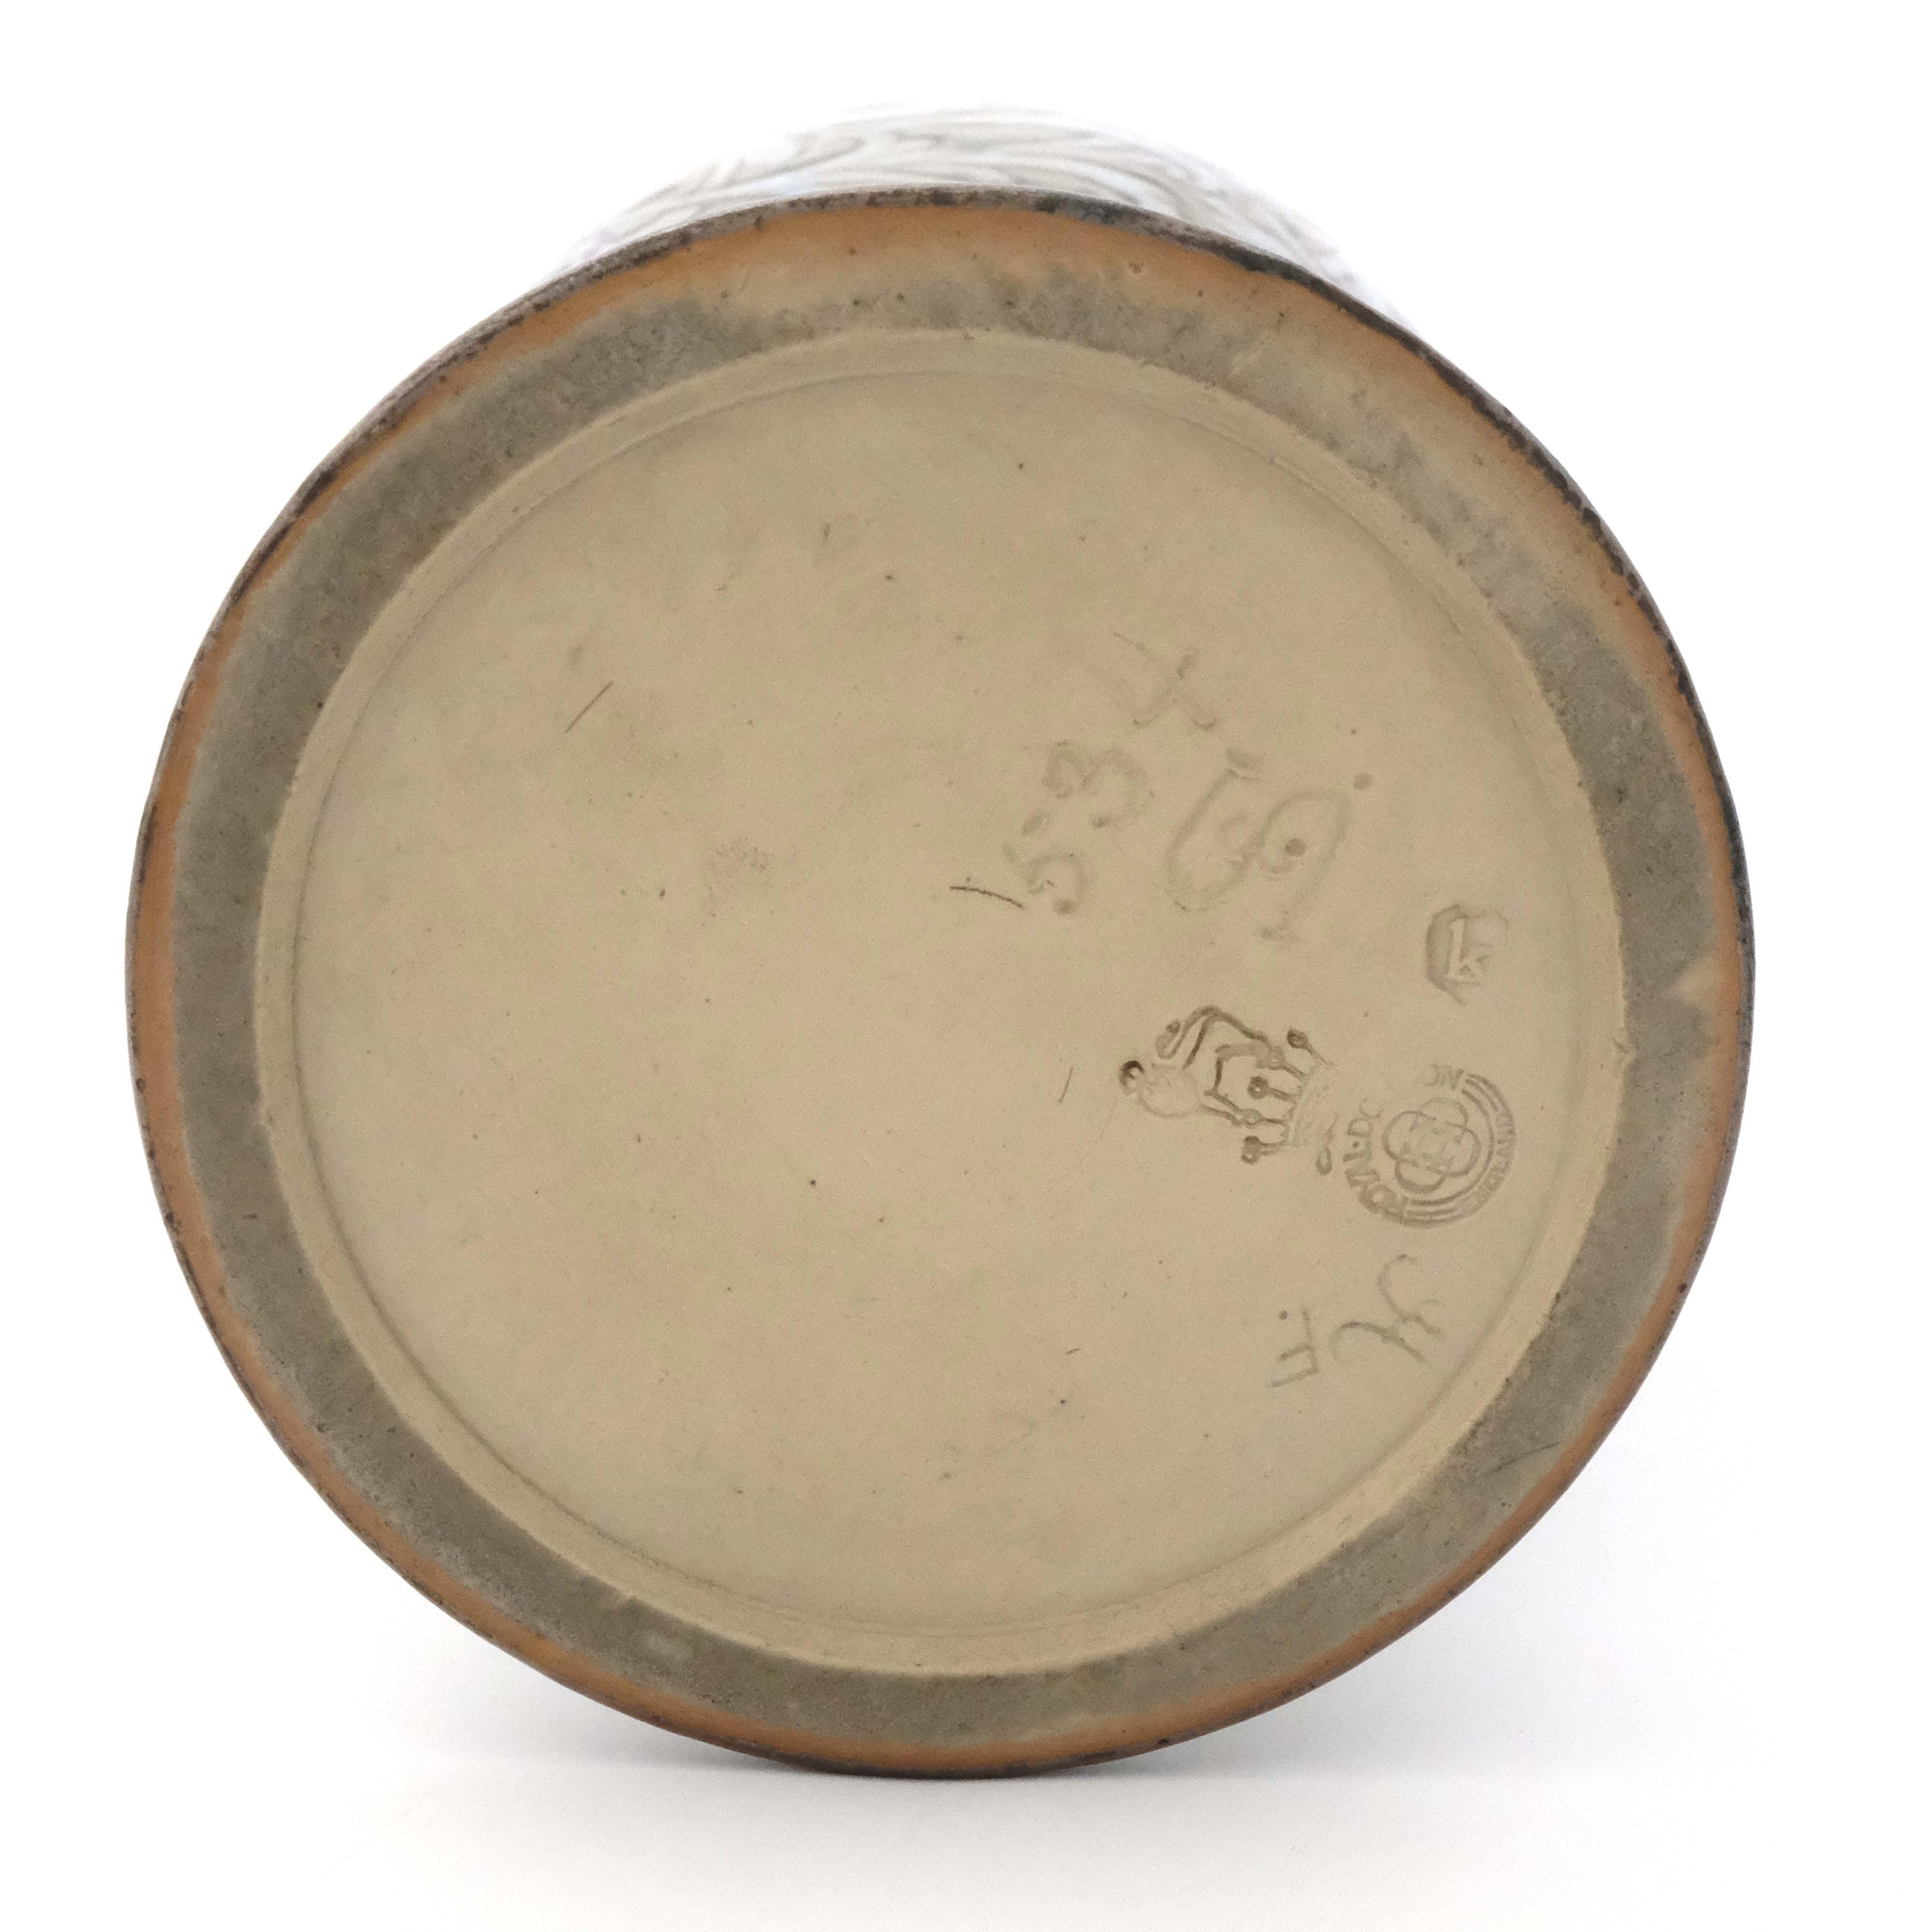 Eliza Simmance for Royal Doulton, a stoneware vase - Image 5 of 5